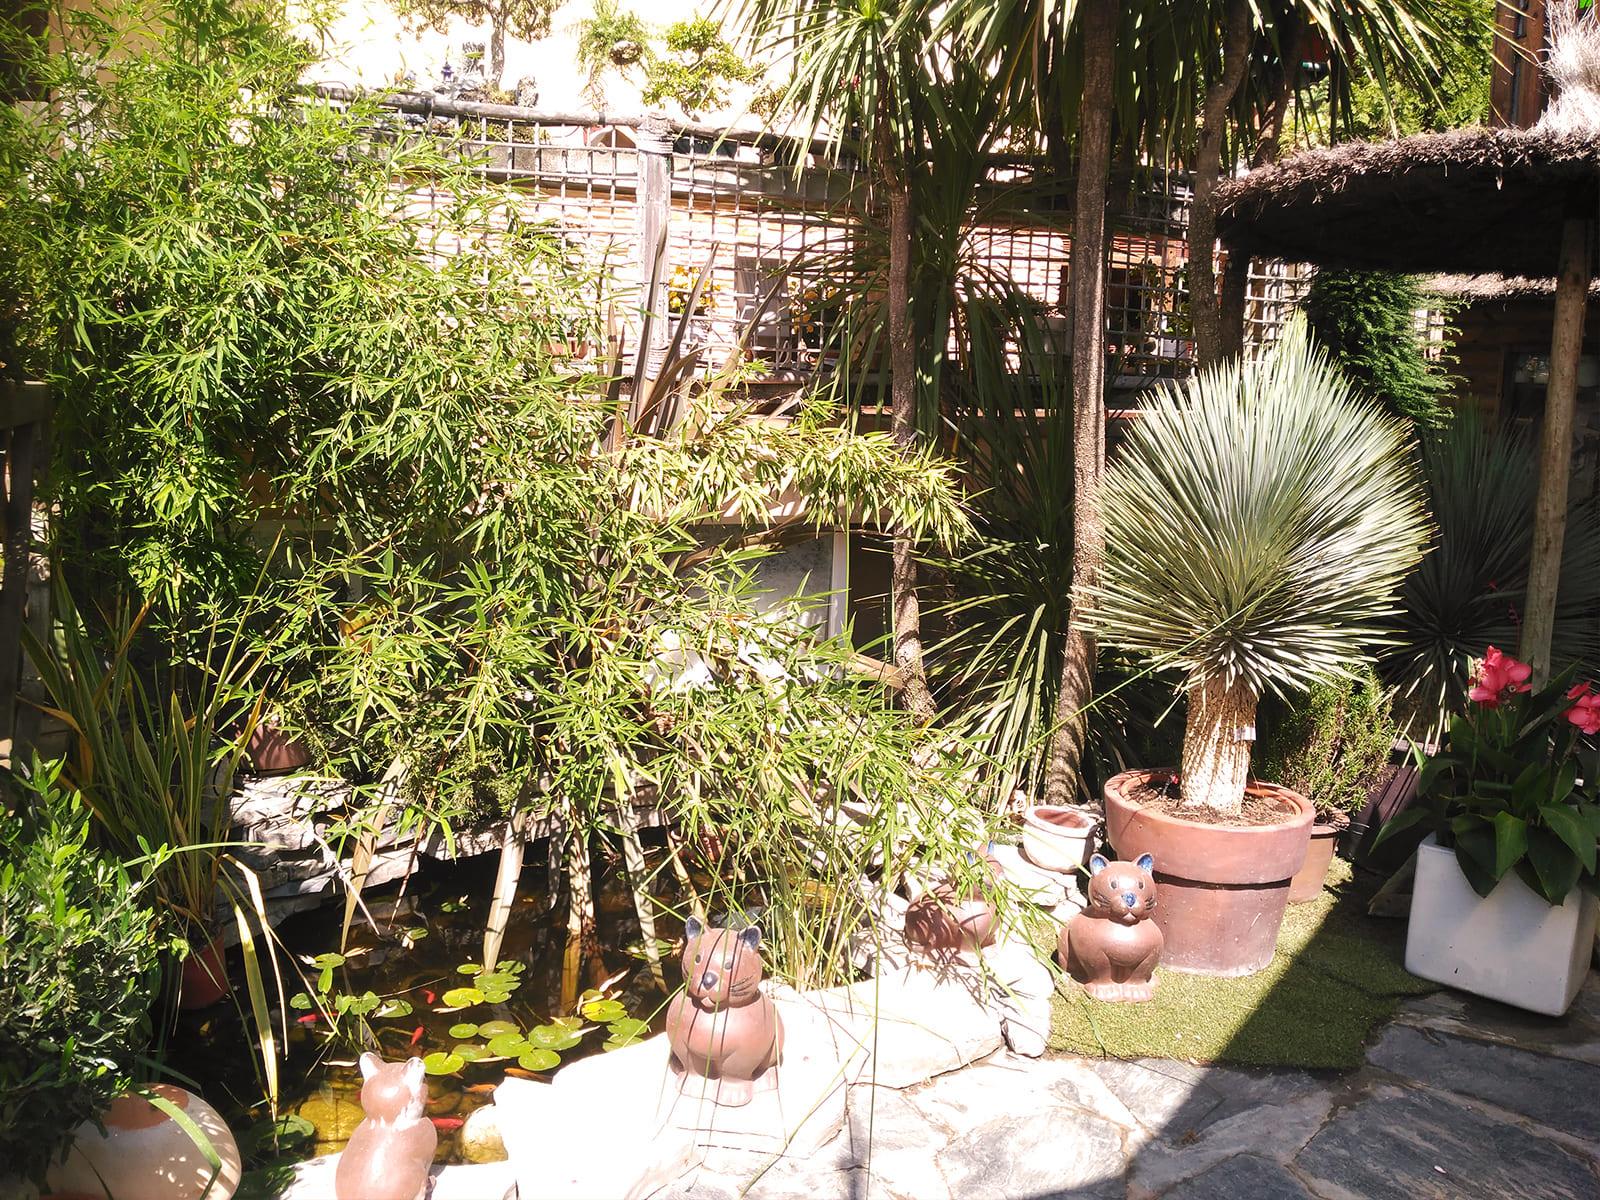 centro-jardineria-garden-invernadero-artesanal-madera-fuente-09_HIDROJARDIN-Bañeres